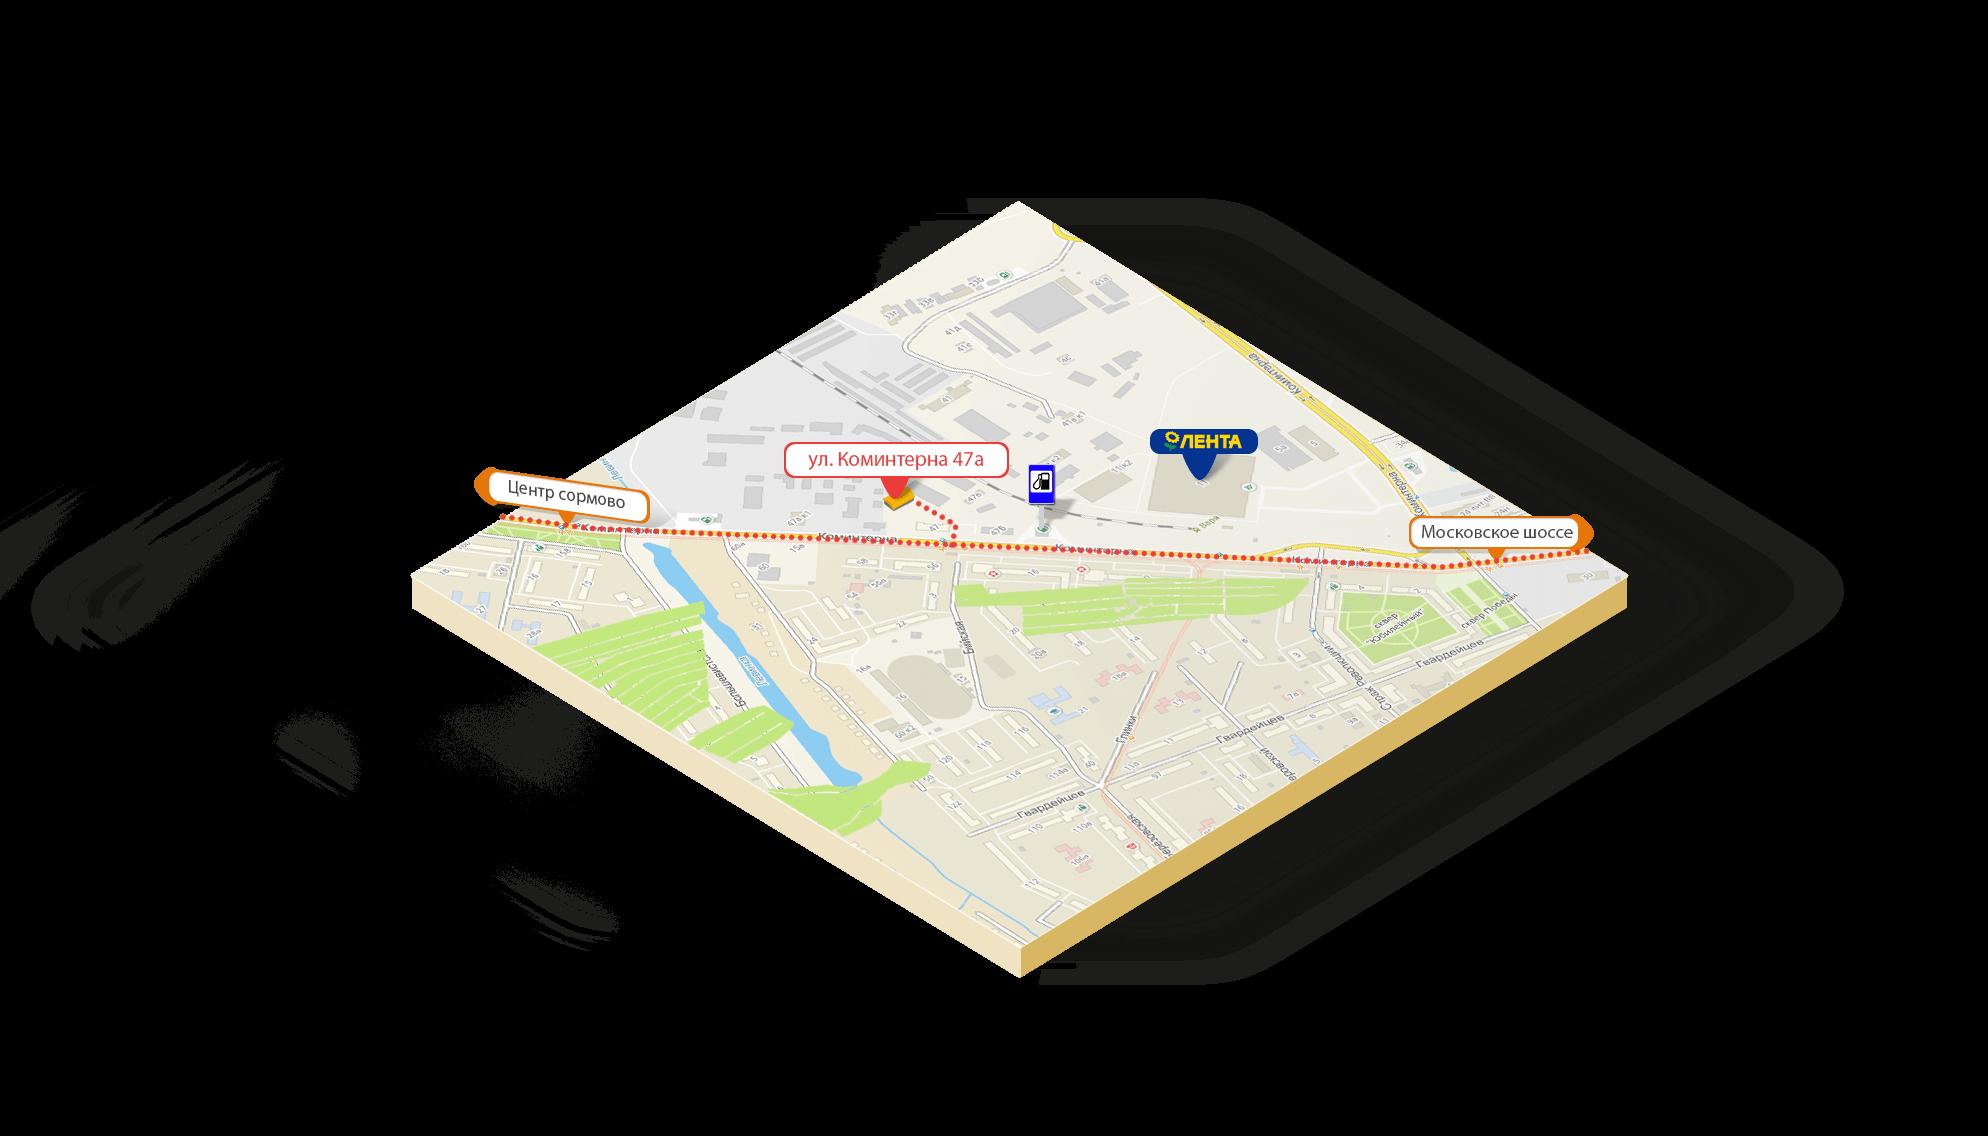 Схема проезда на склад ул. Коминтерна, 47А